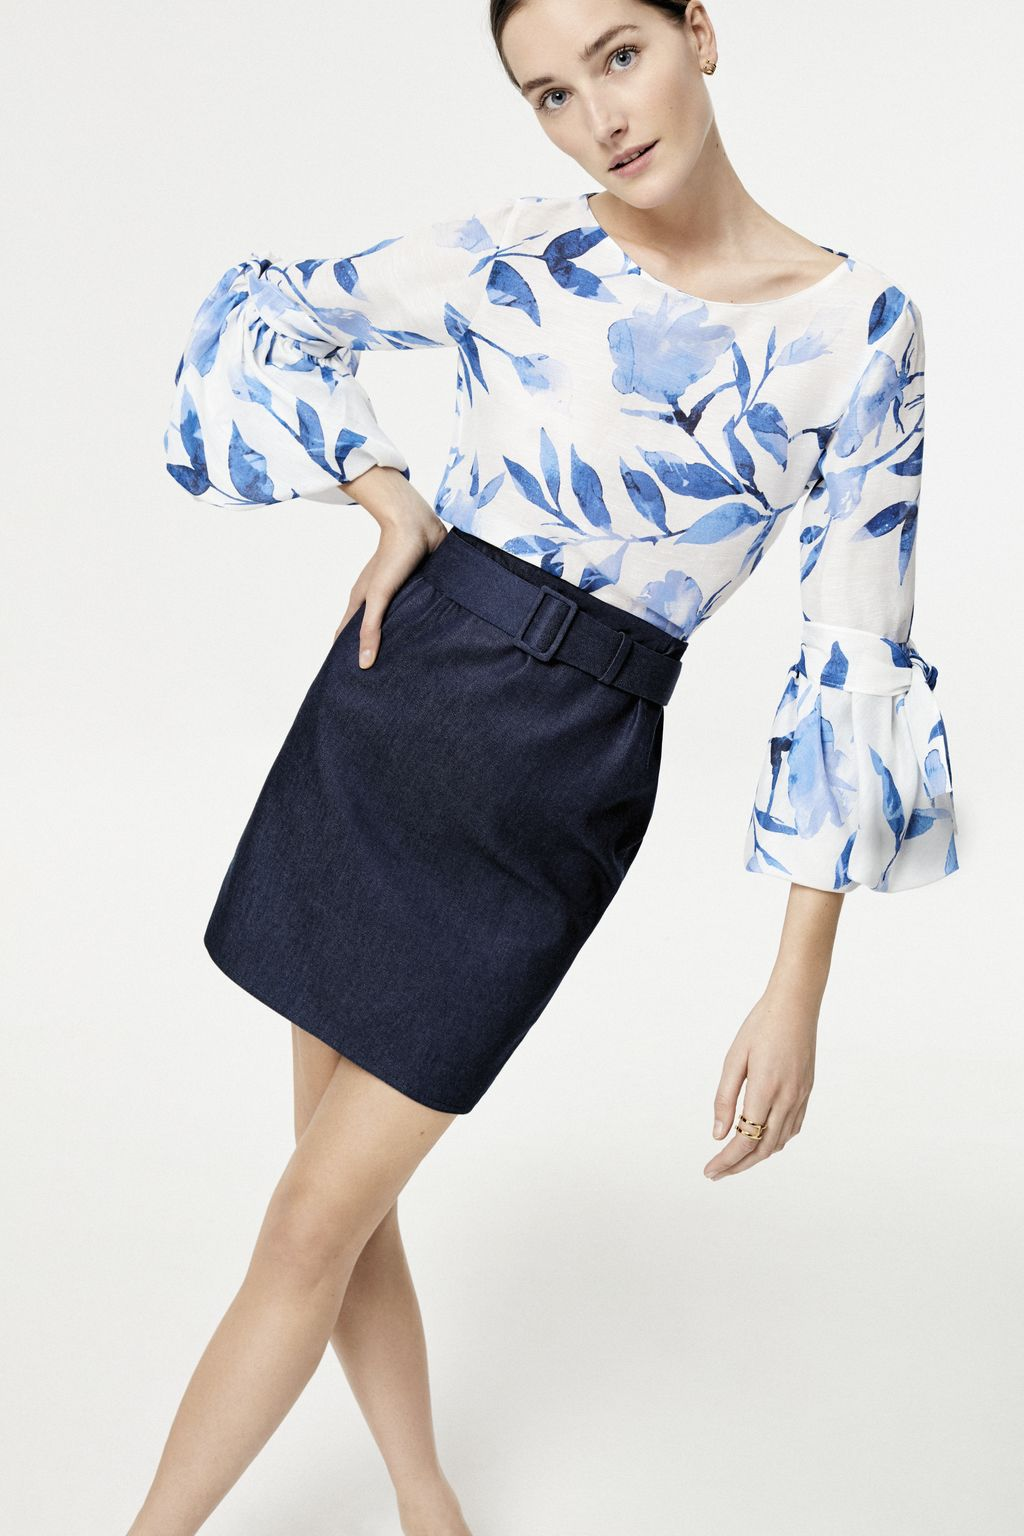 CH in Bloom gazar blouse